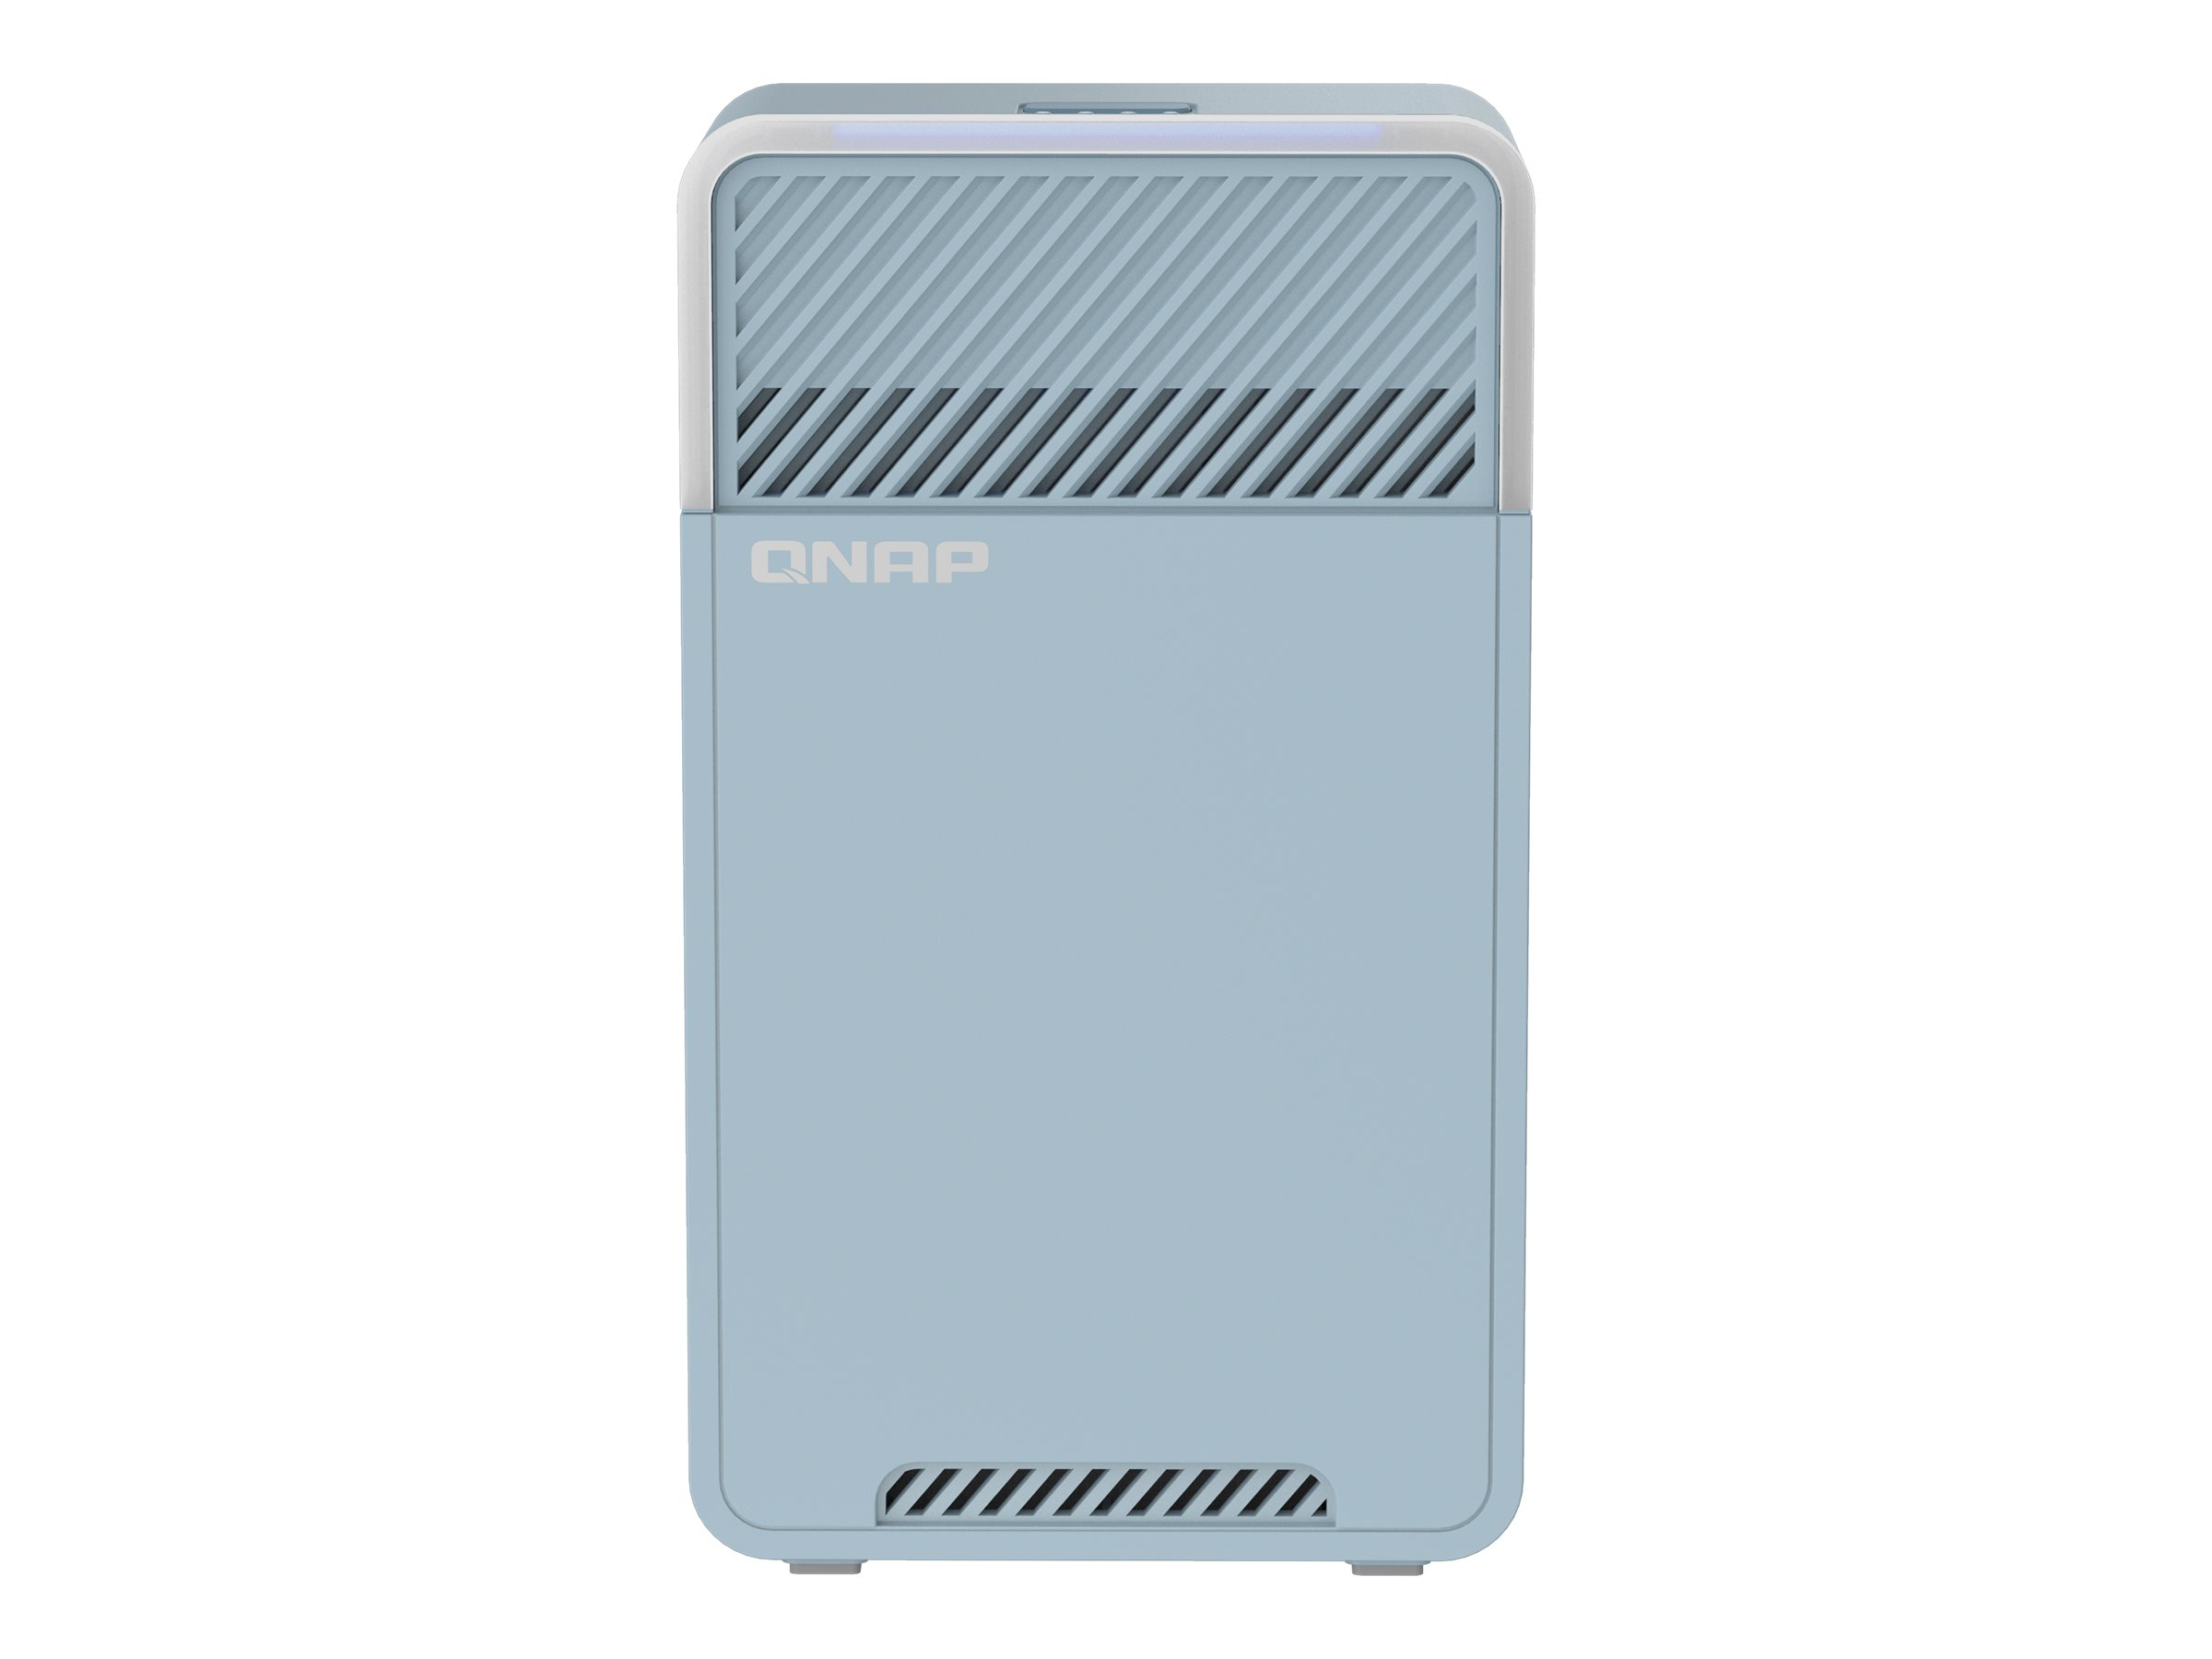 QNAP QMiro-201W - Wireless Router - GigE - 802.11a/b/g/n/ac, Bluetooth 5.0